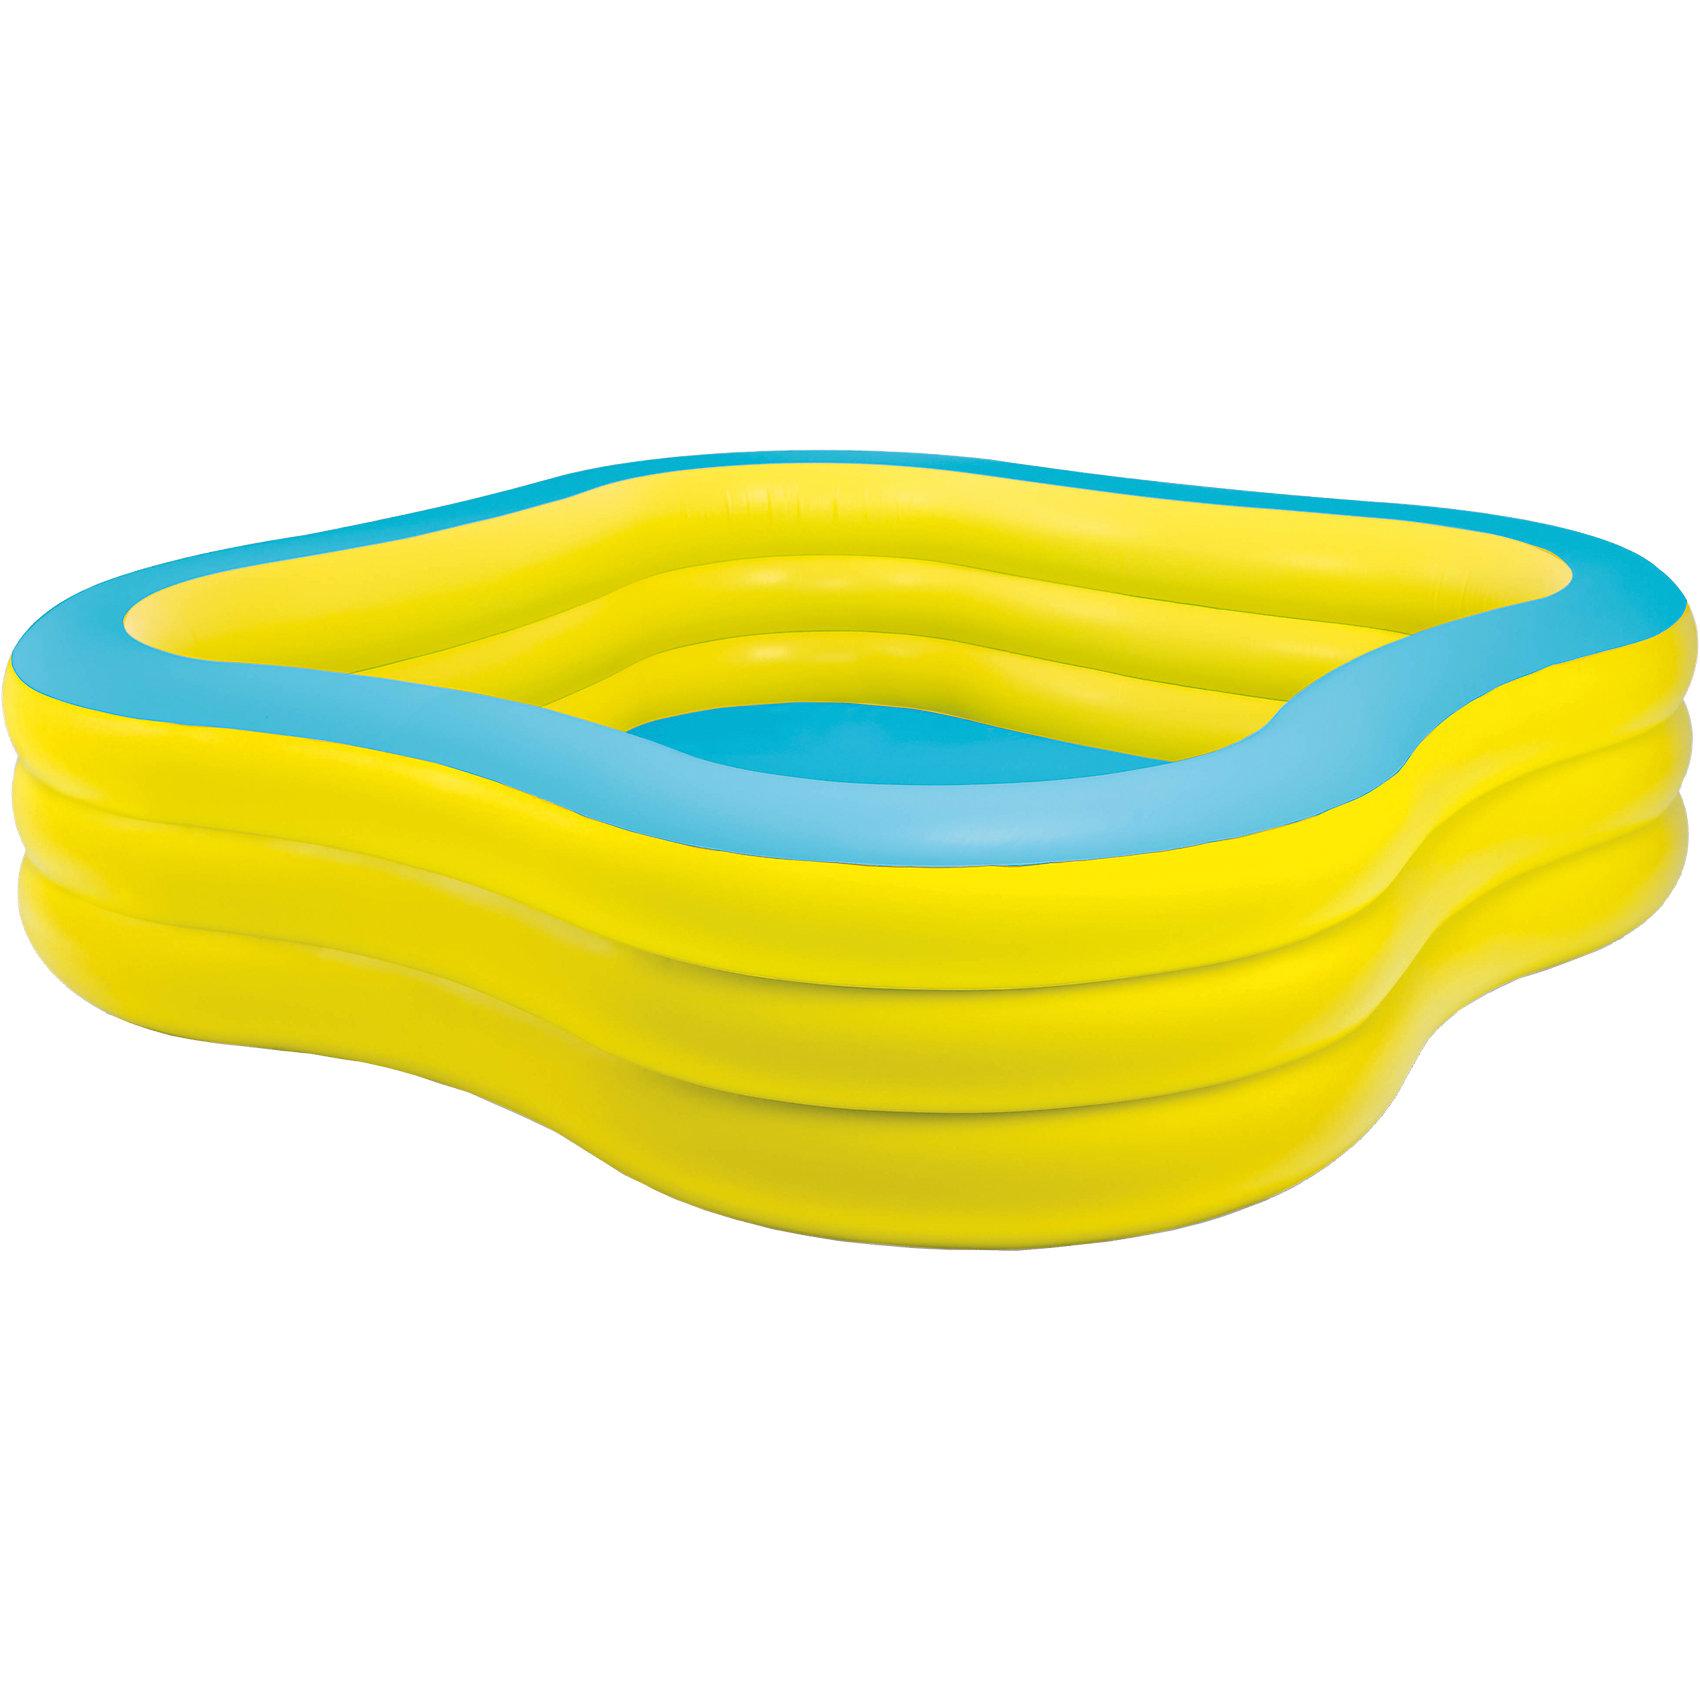 Intex Детский надувной бассейн Семейный, Intex